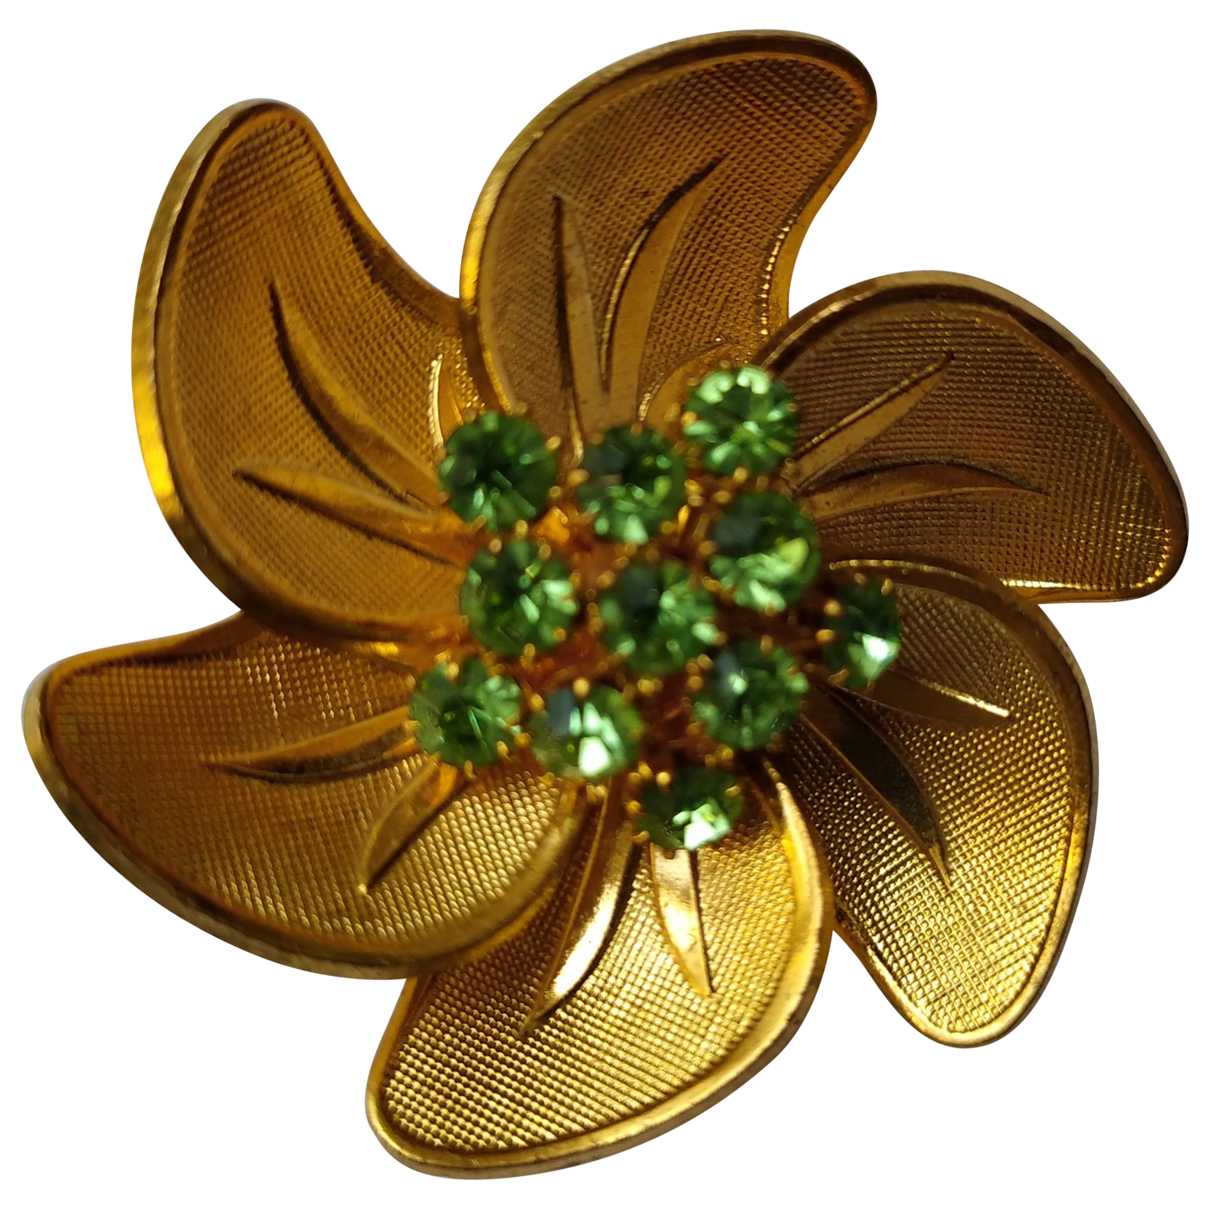 Broche Motifs Floraux en Metal Dorado Non Signe / Unsigned